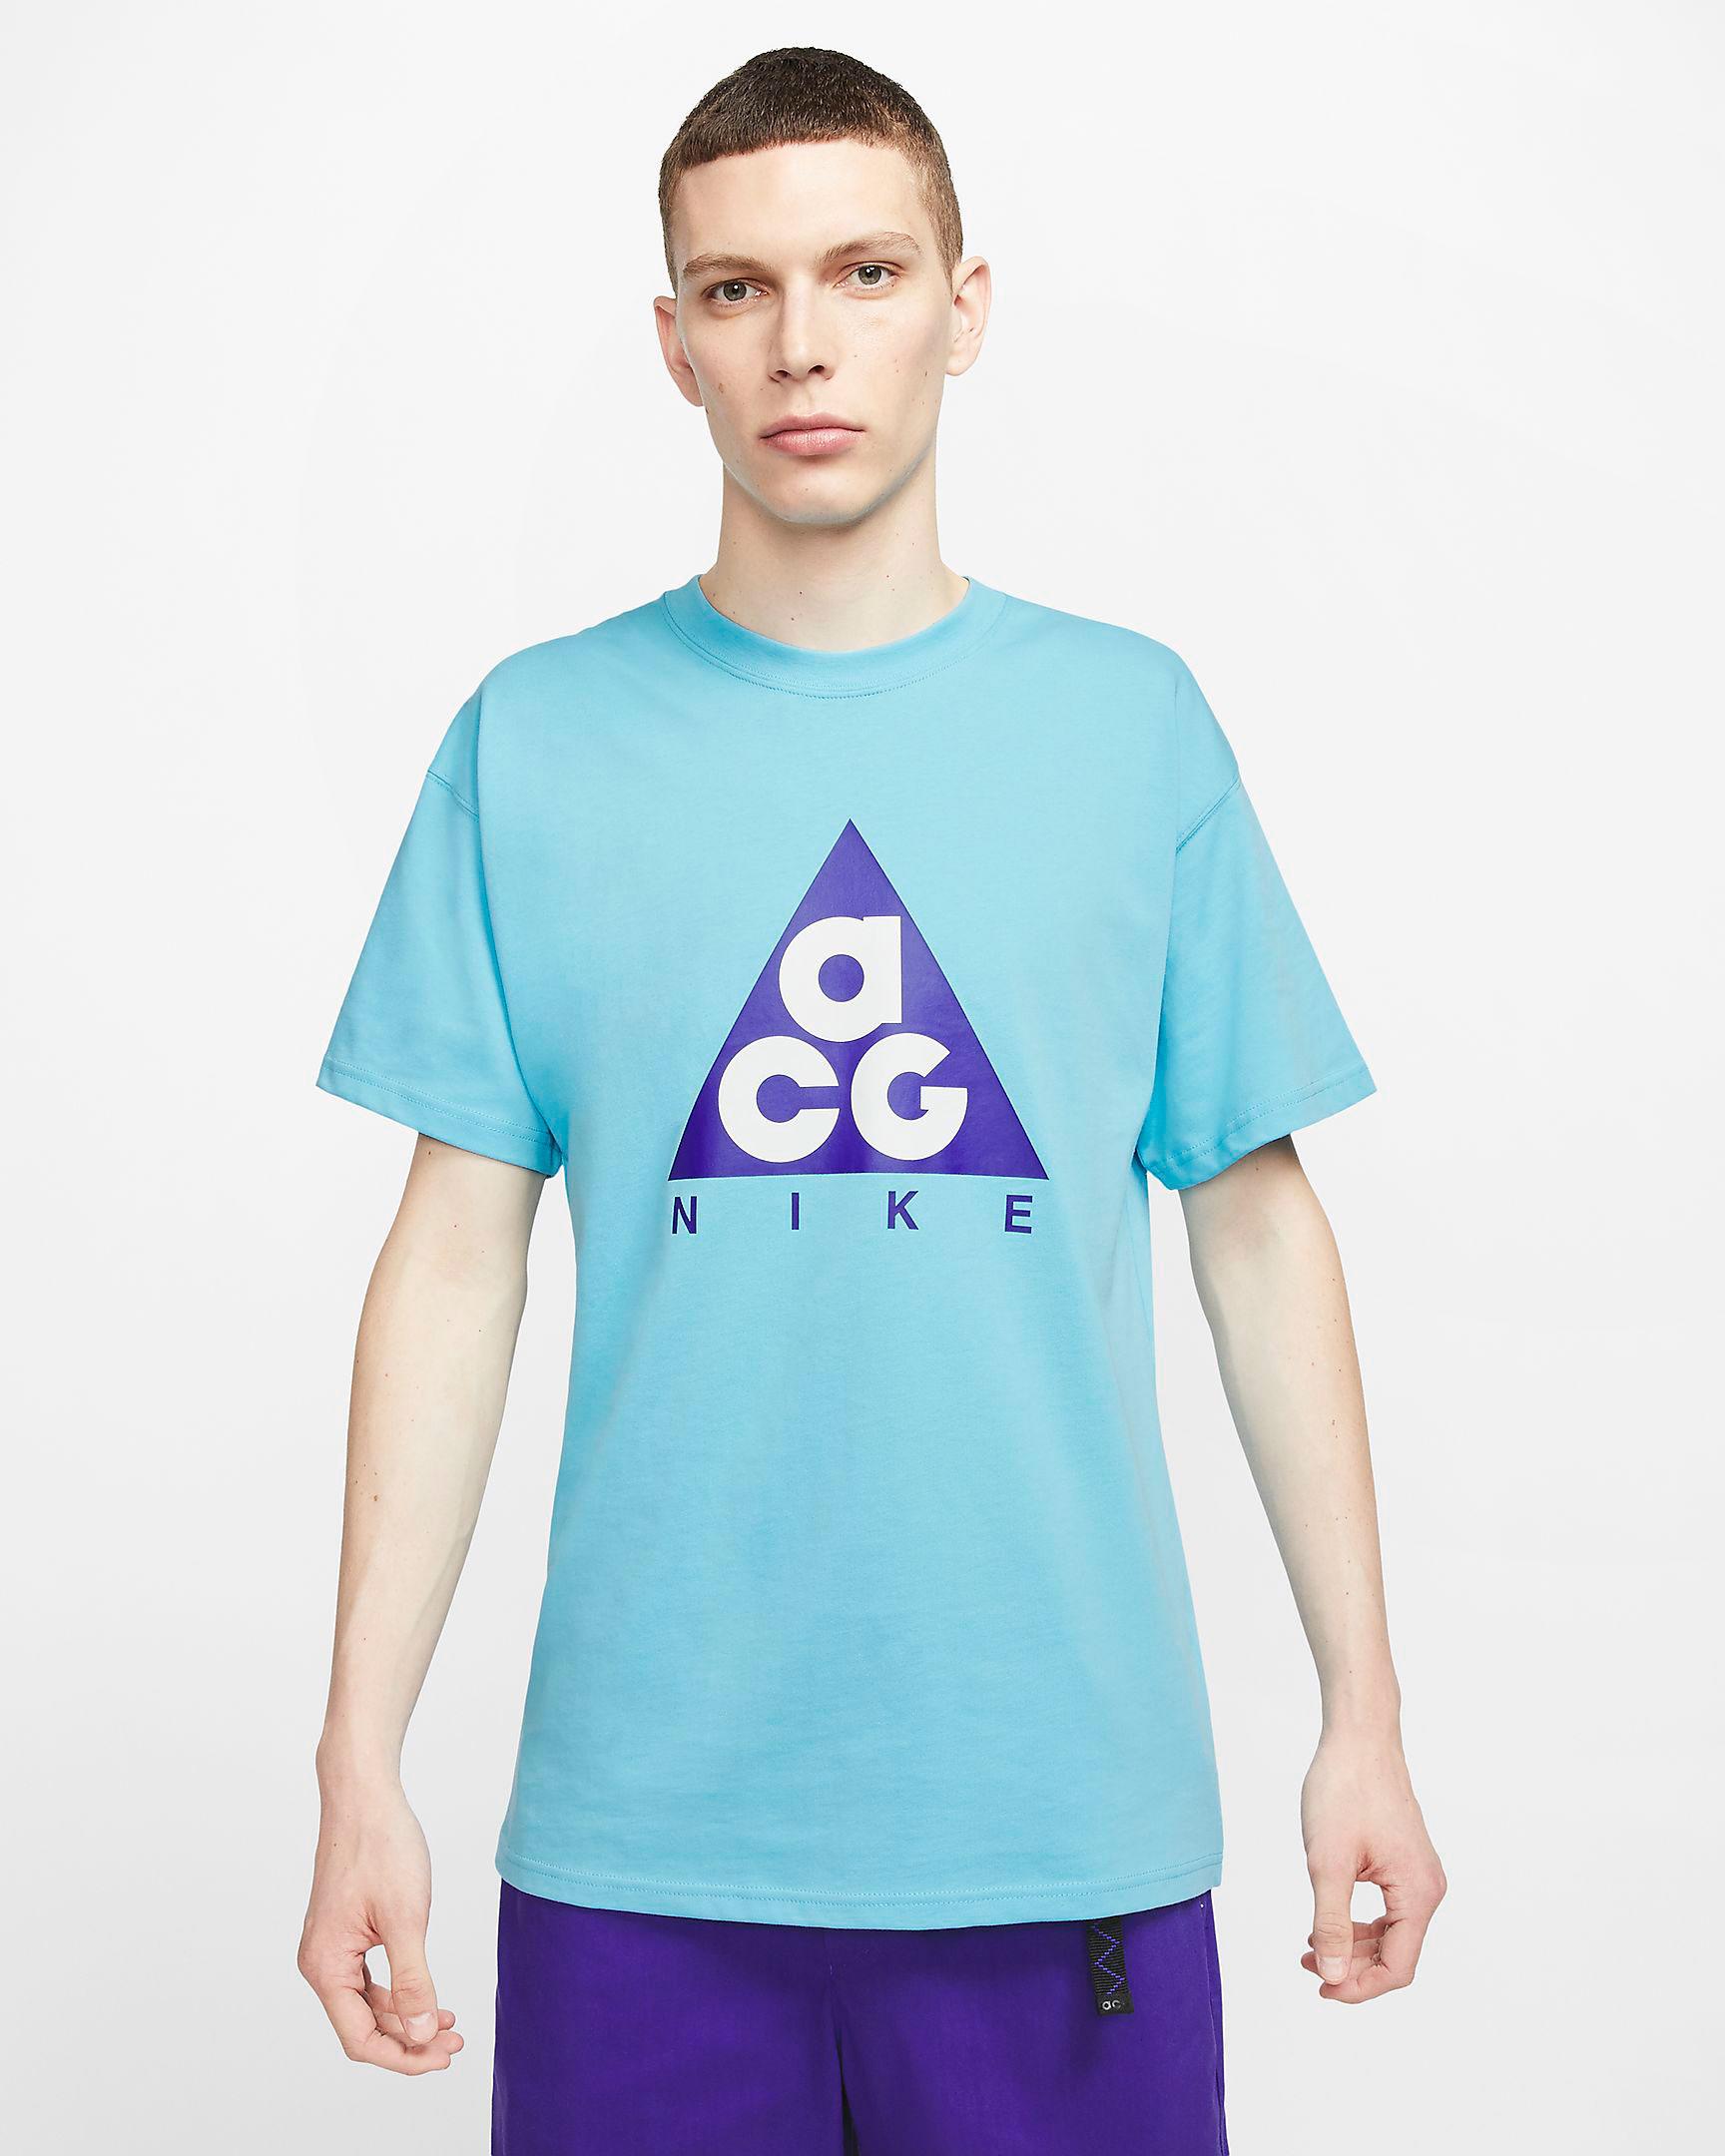 nike-acg-logo-t-shirt-blue-purple